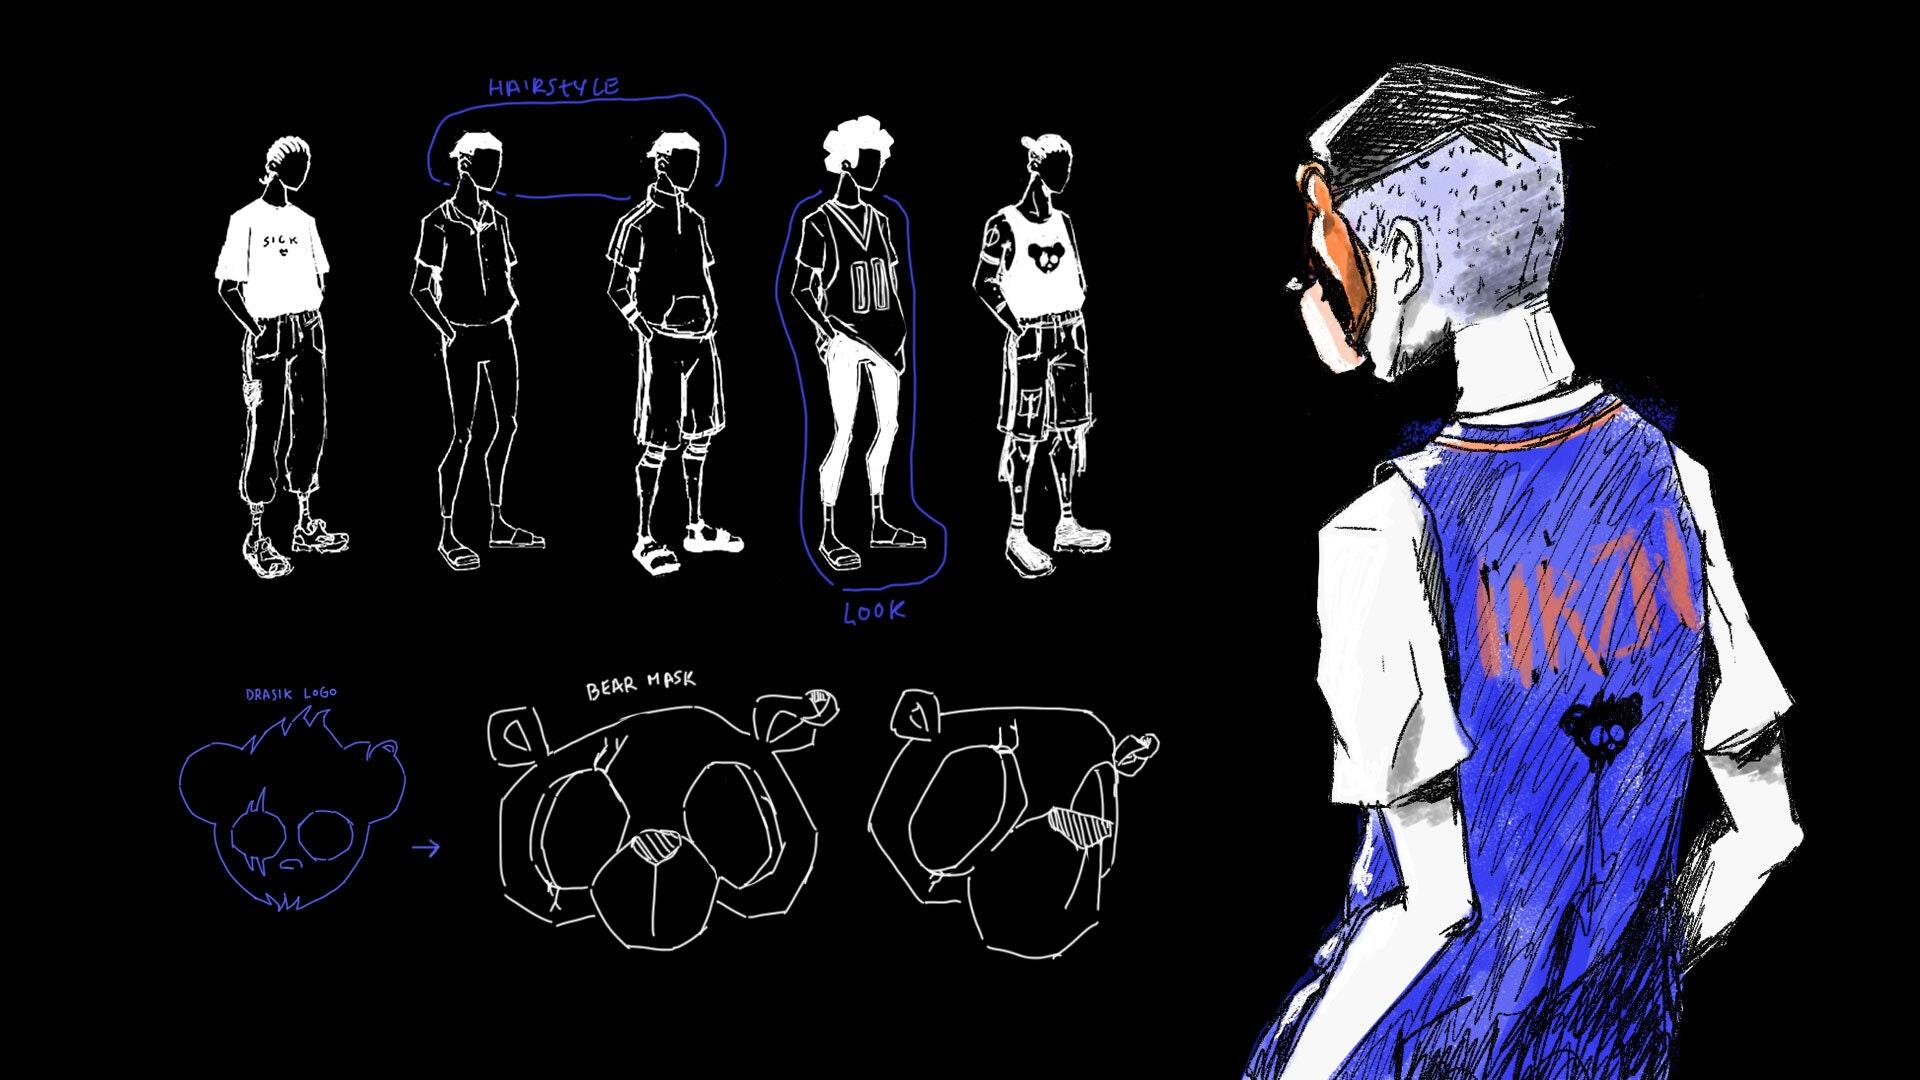 Half human half bear character design